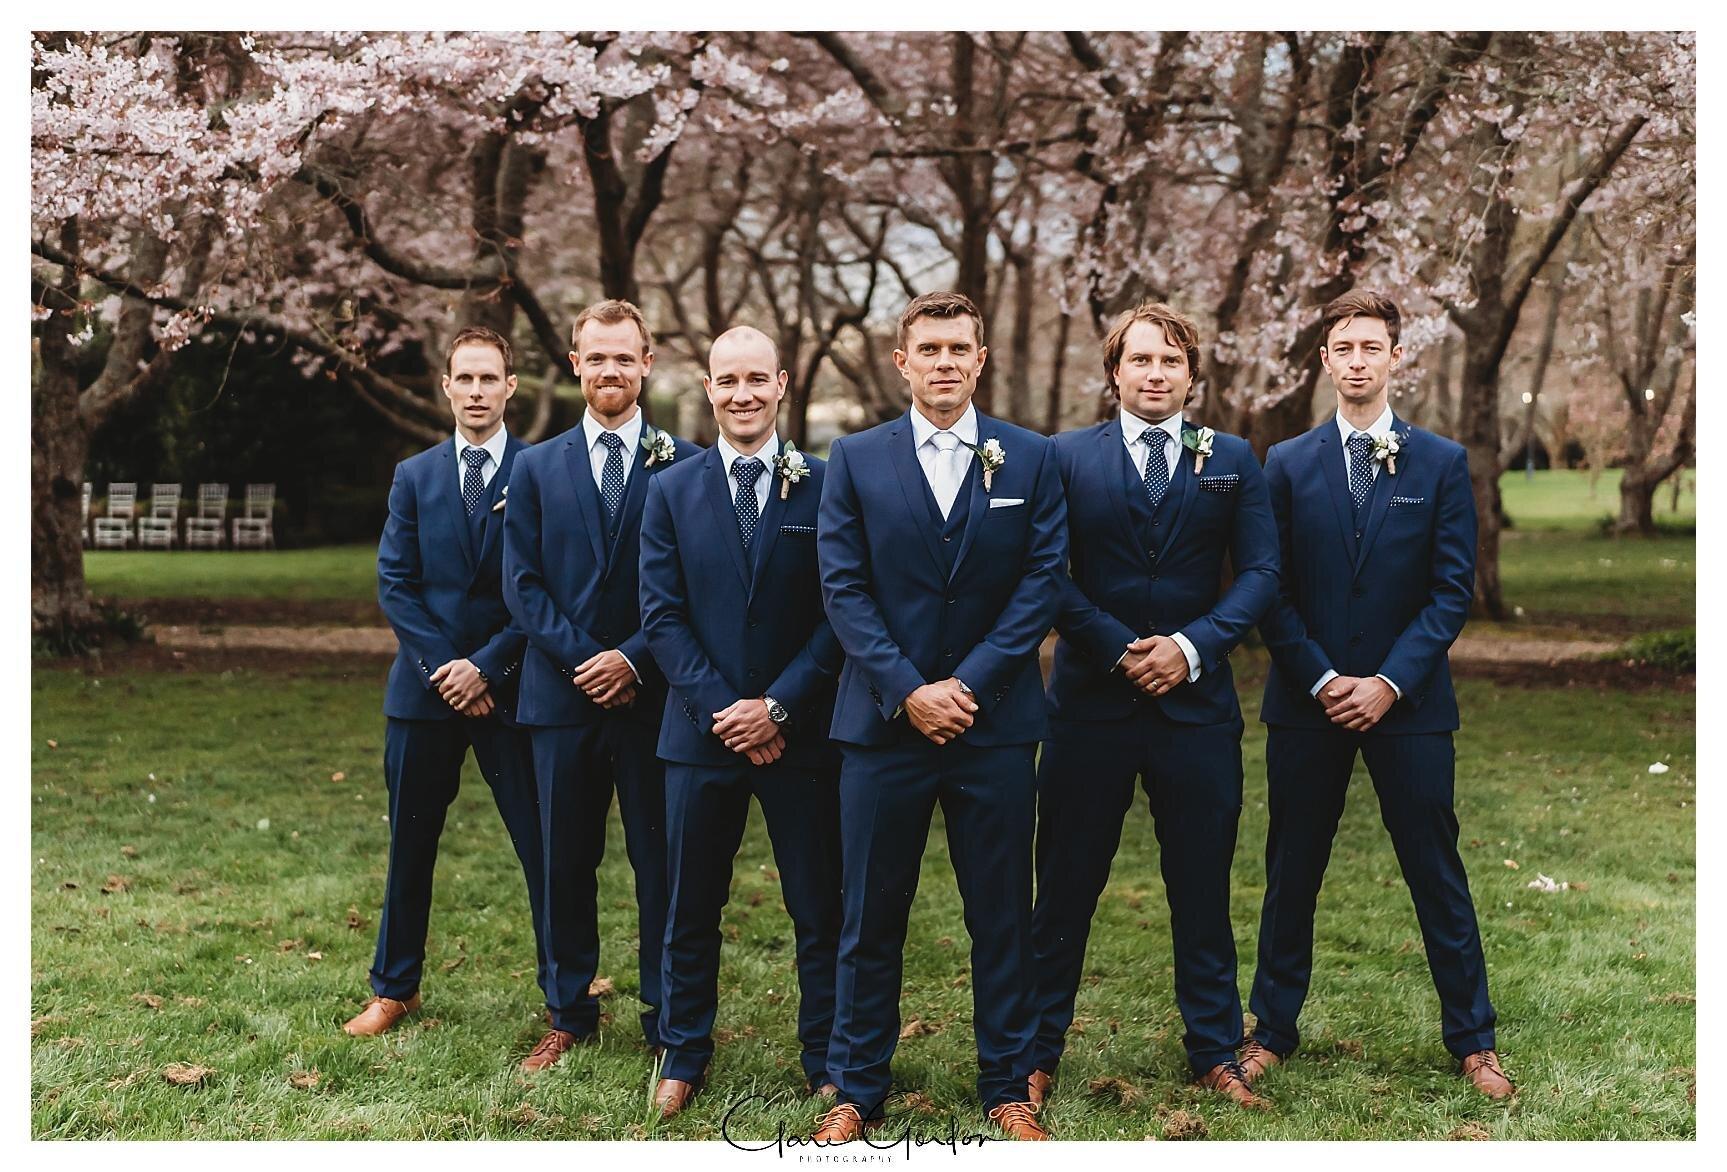 Henley-Hotel-Cherry-blossom-wedding-photos (70).jpg